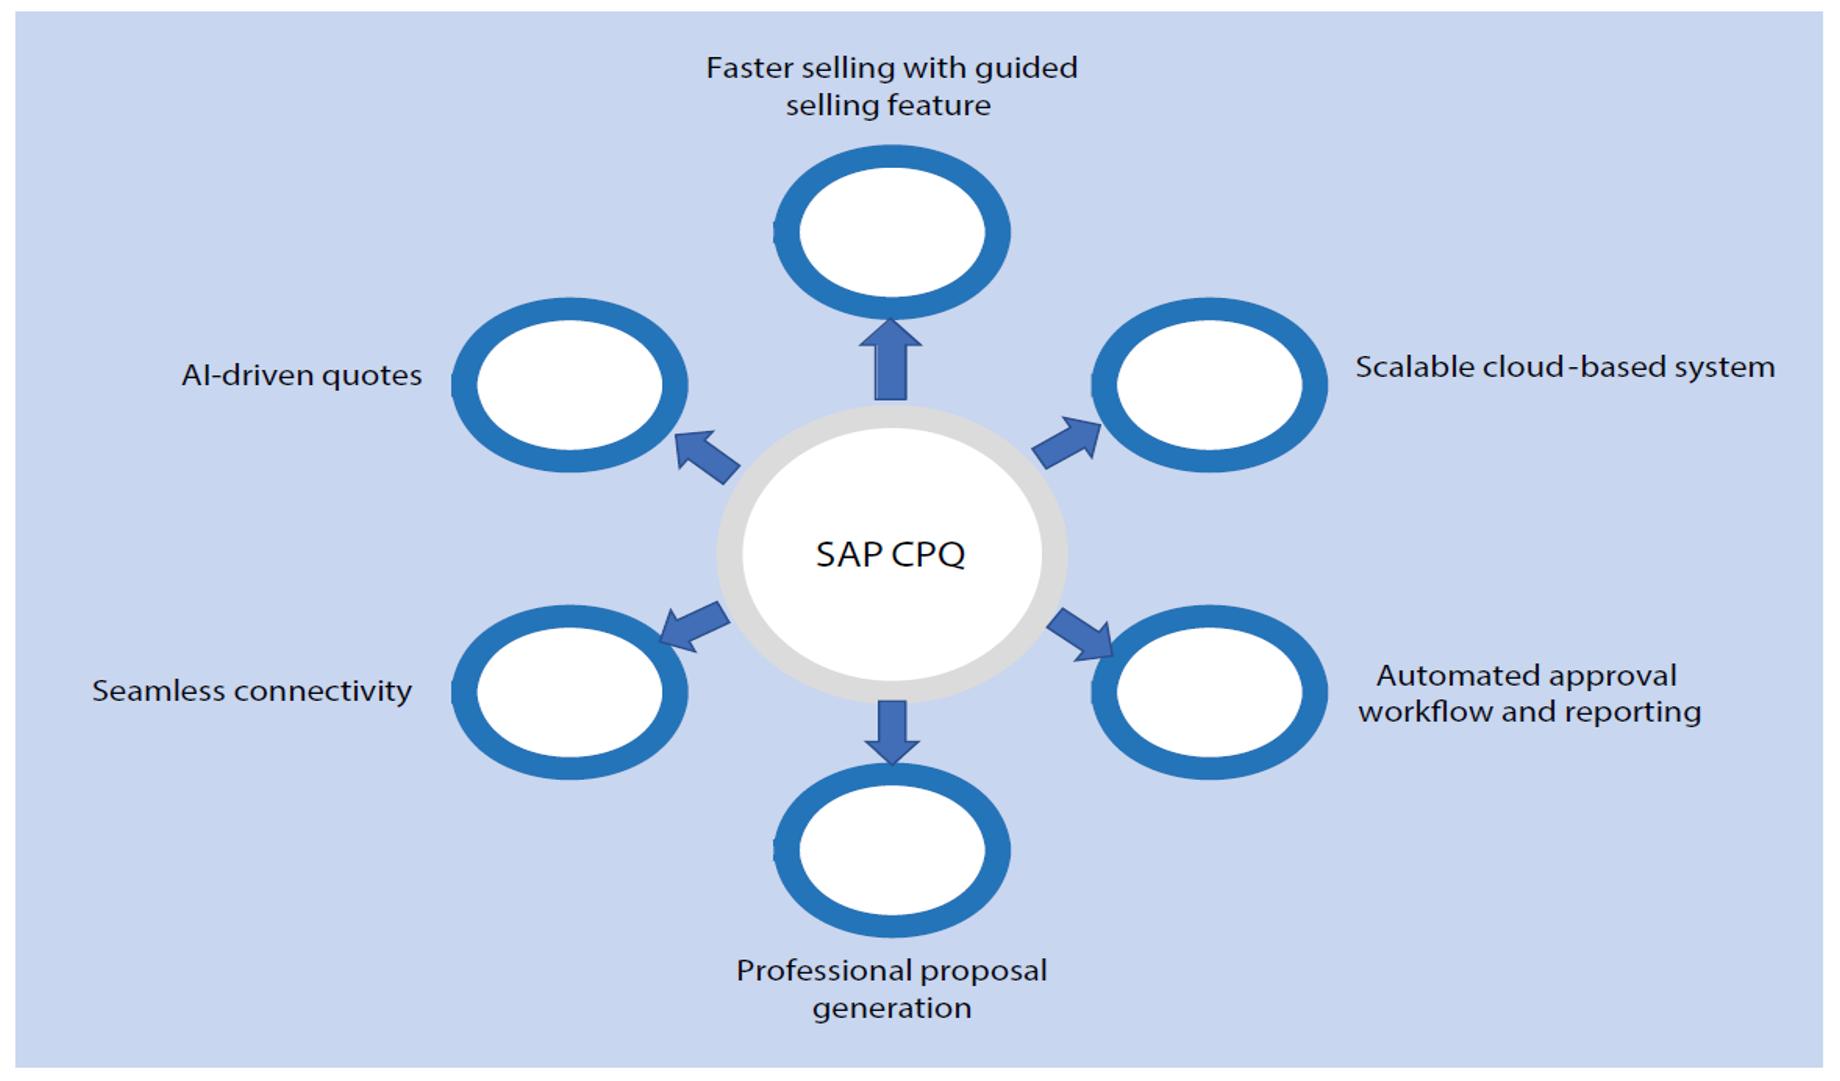 SAP CPQ's Key Capabilities